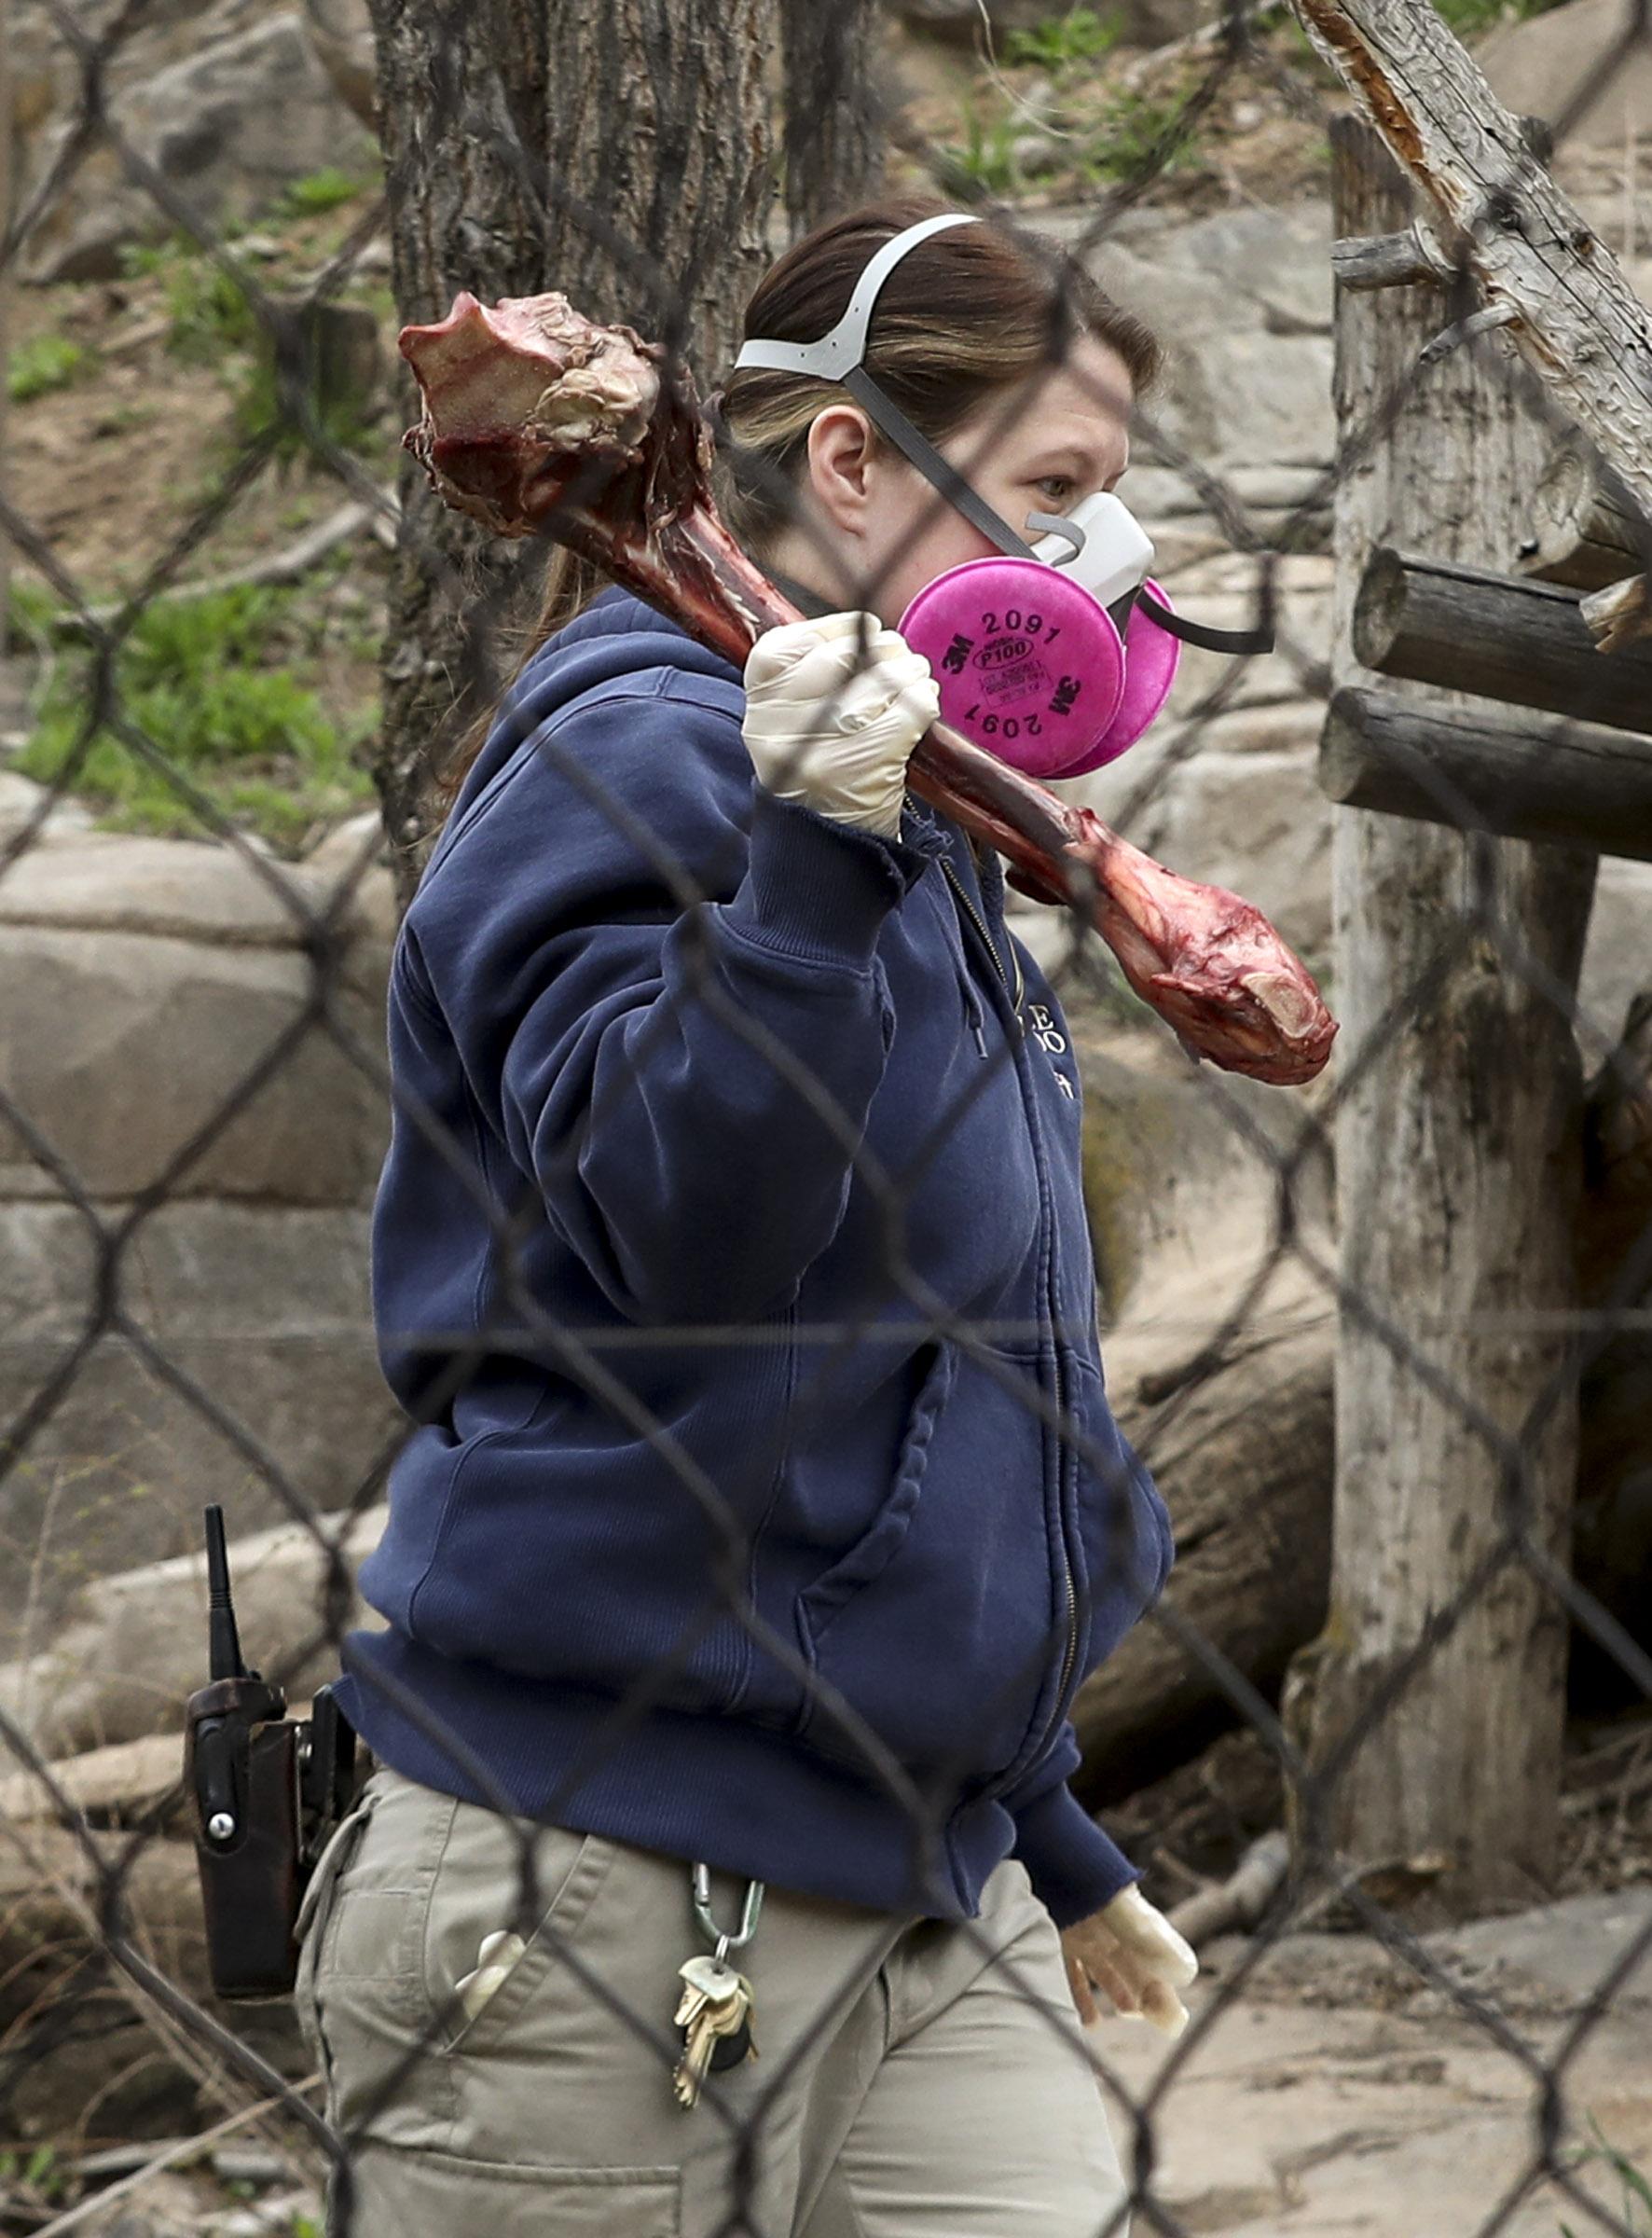 Hogle Zoo Taking Coronavirus Precautions With Lions Tigers Deseret News